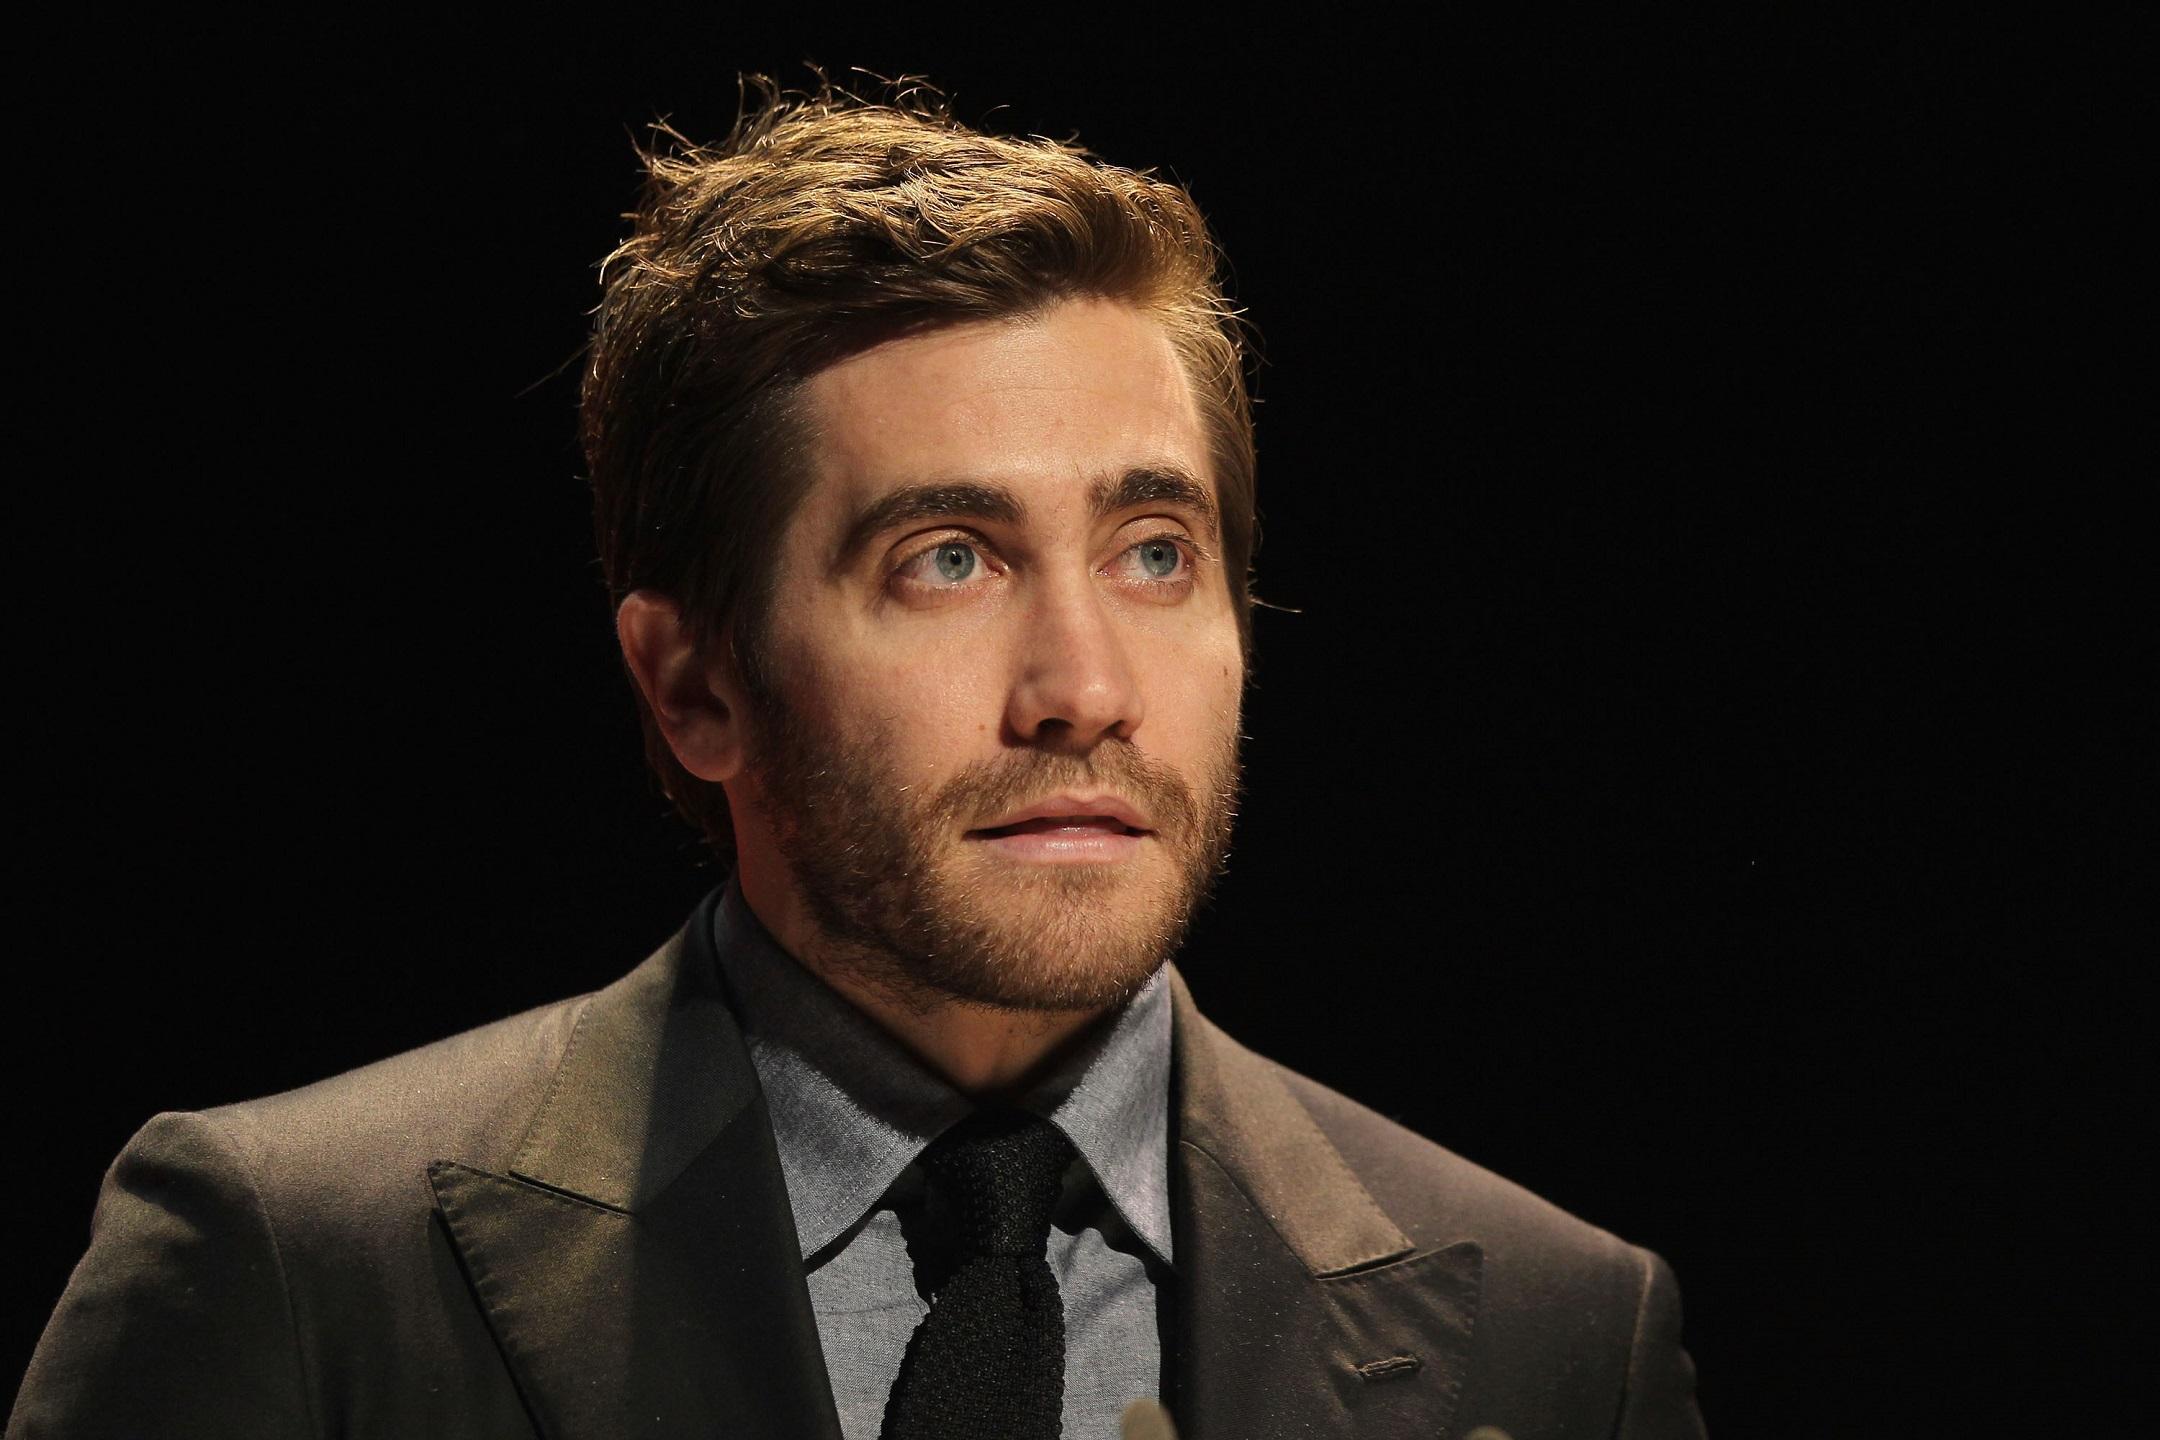 Jake Gyllenhaal Hd Background